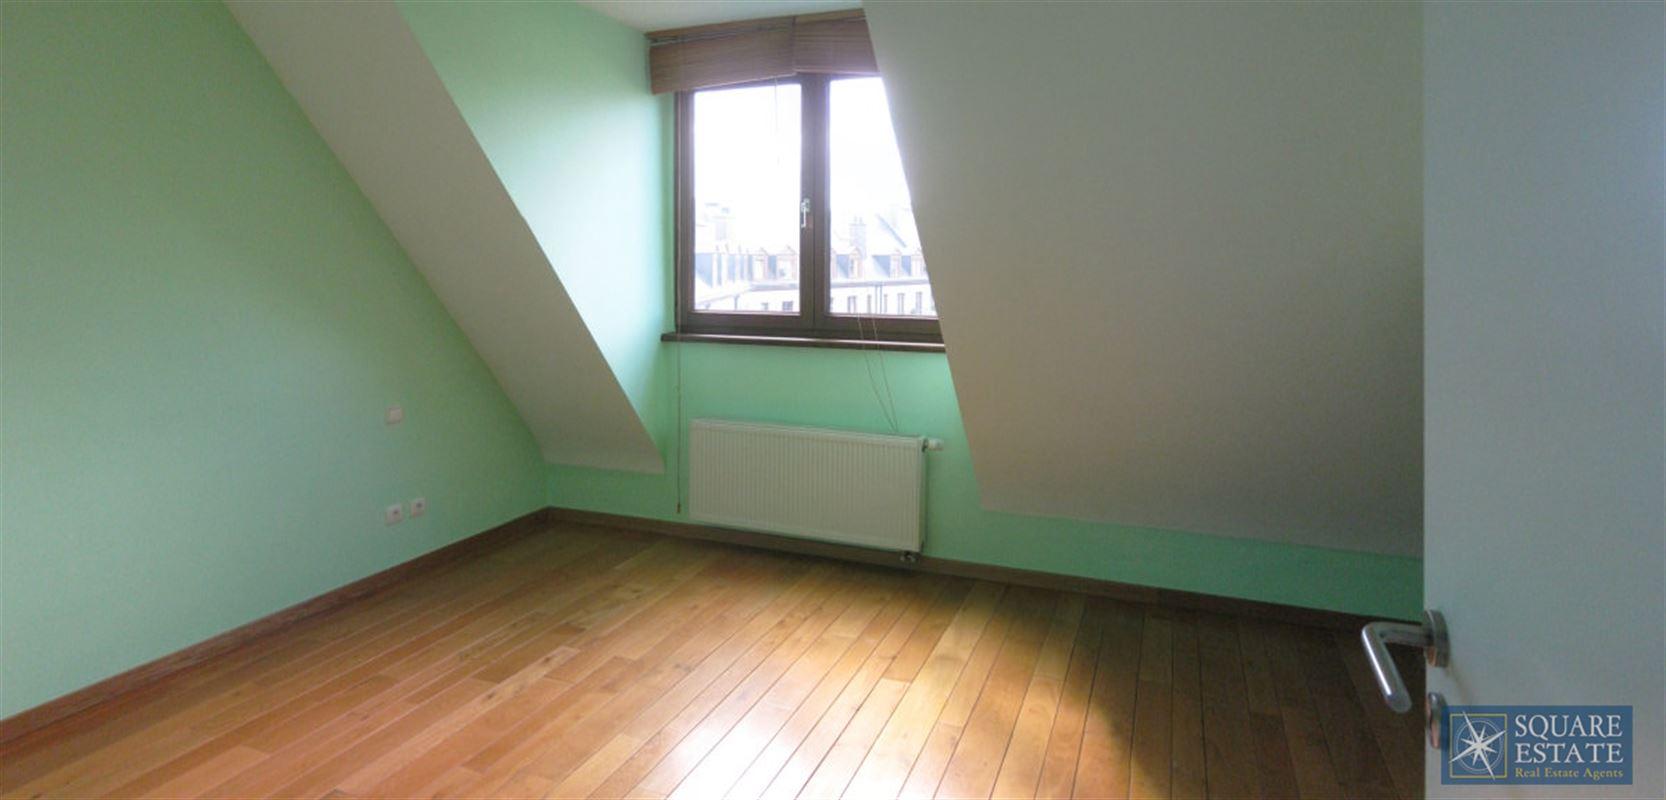 Foto 7 : Duplex/Penthouse te 1780 Wemmel (België) - Prijs € 1.100